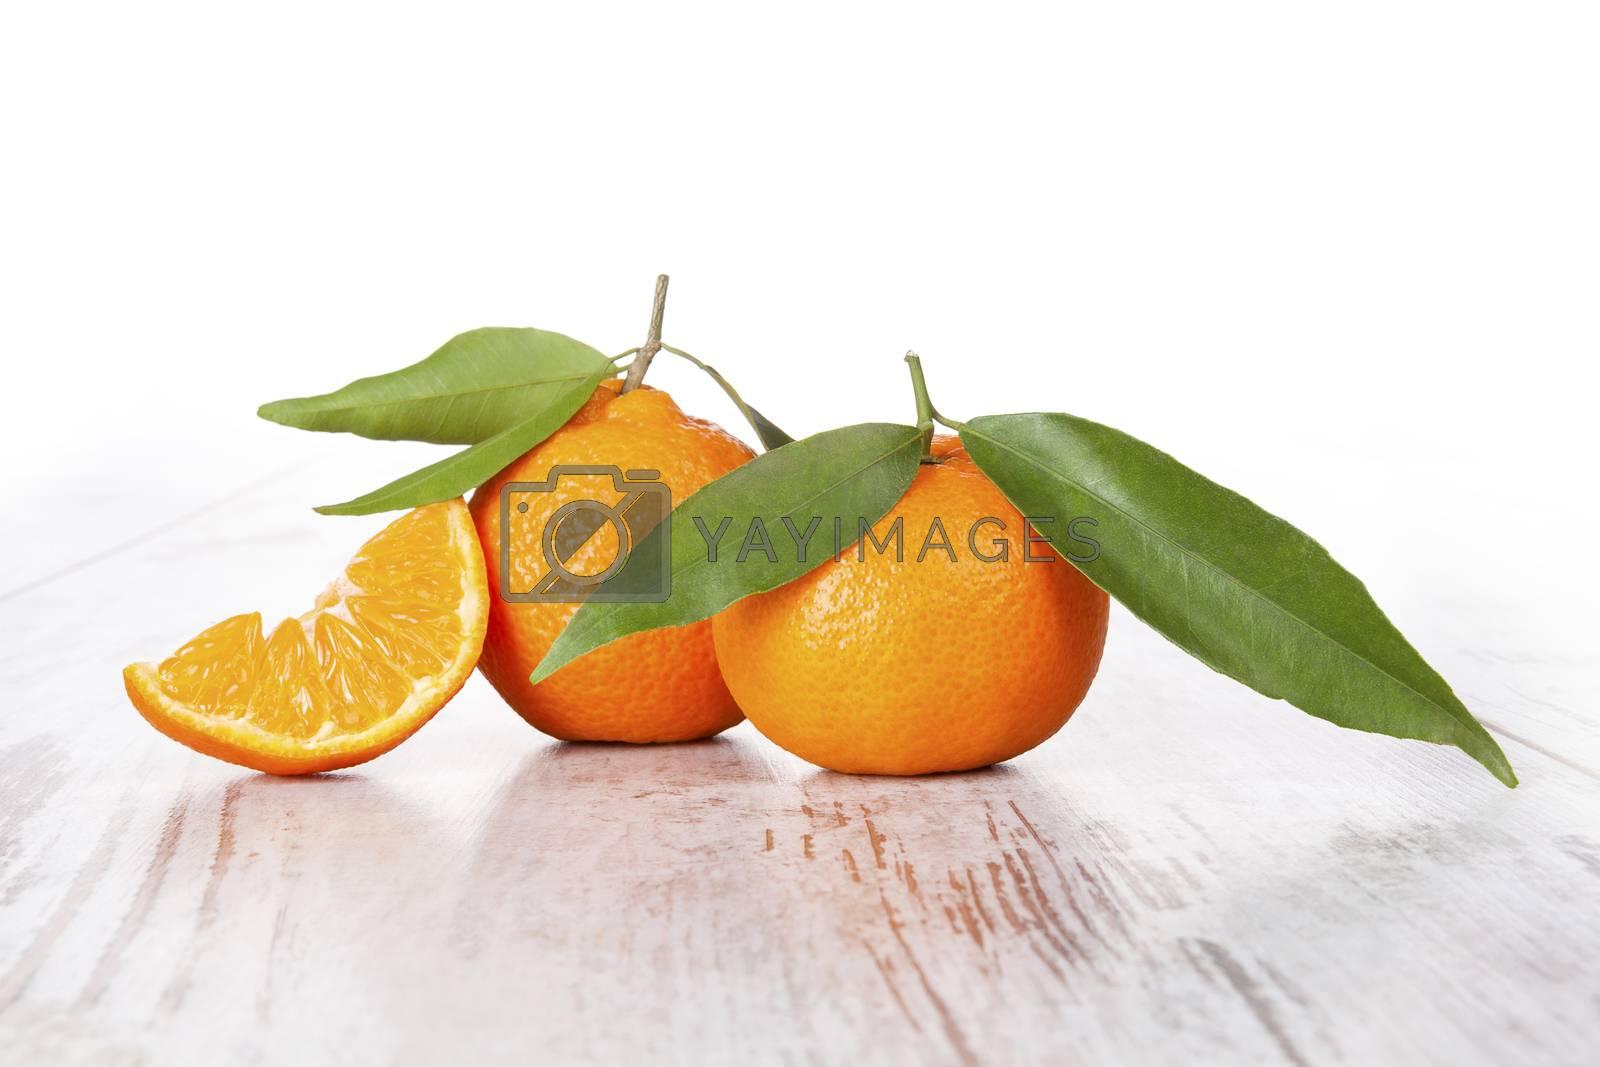 Mandarine fruit on white wooden table. Provence style.